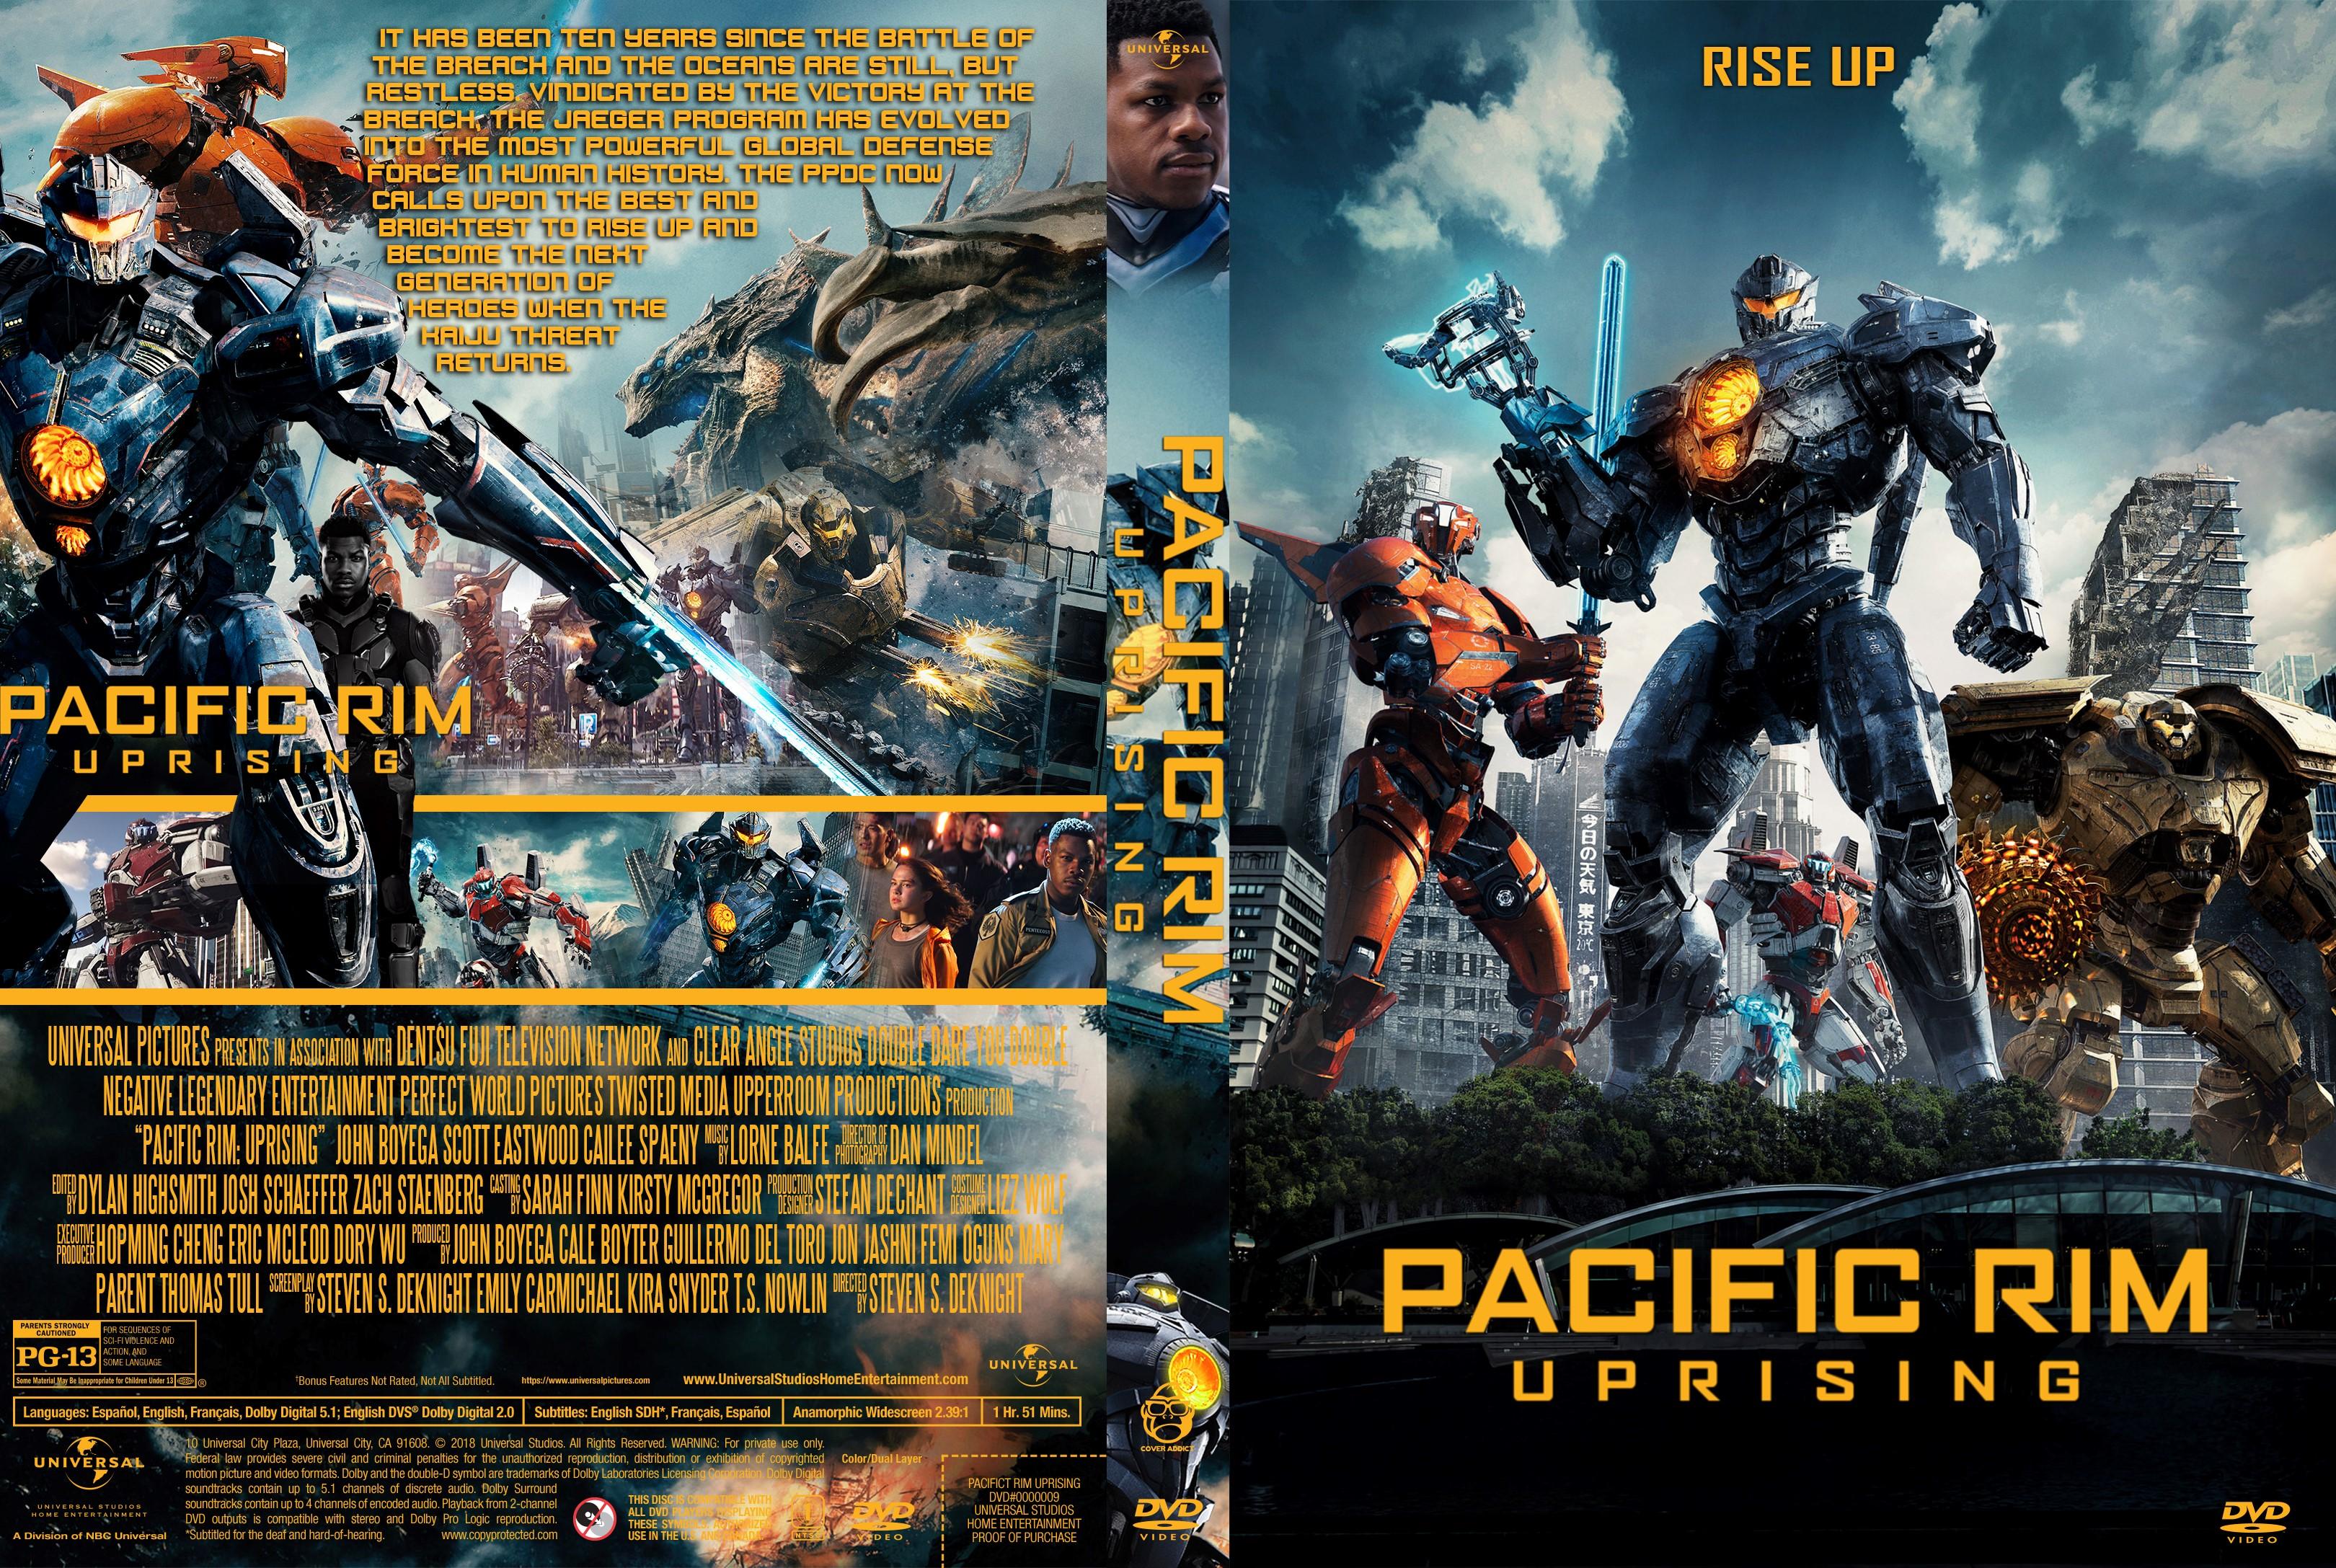 Pacific Rim Uprising DVD Cover | Cover Addict - Free DVD ... Pacific Rim Dvd Cover